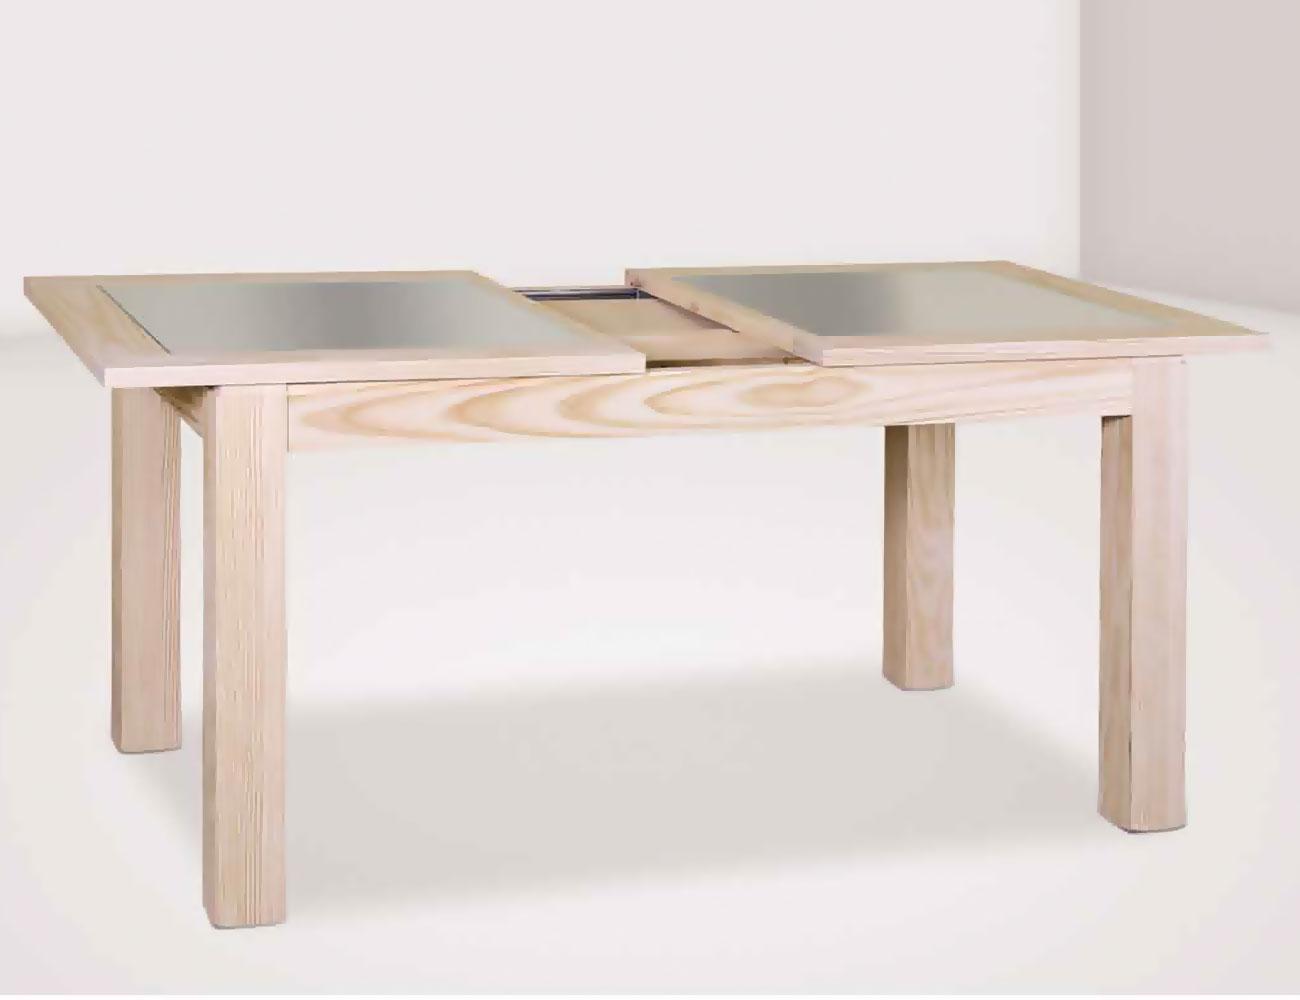 Mesa comedor fija 140 cm en madera con tapa cristal en for Mesa cristal 90 cm